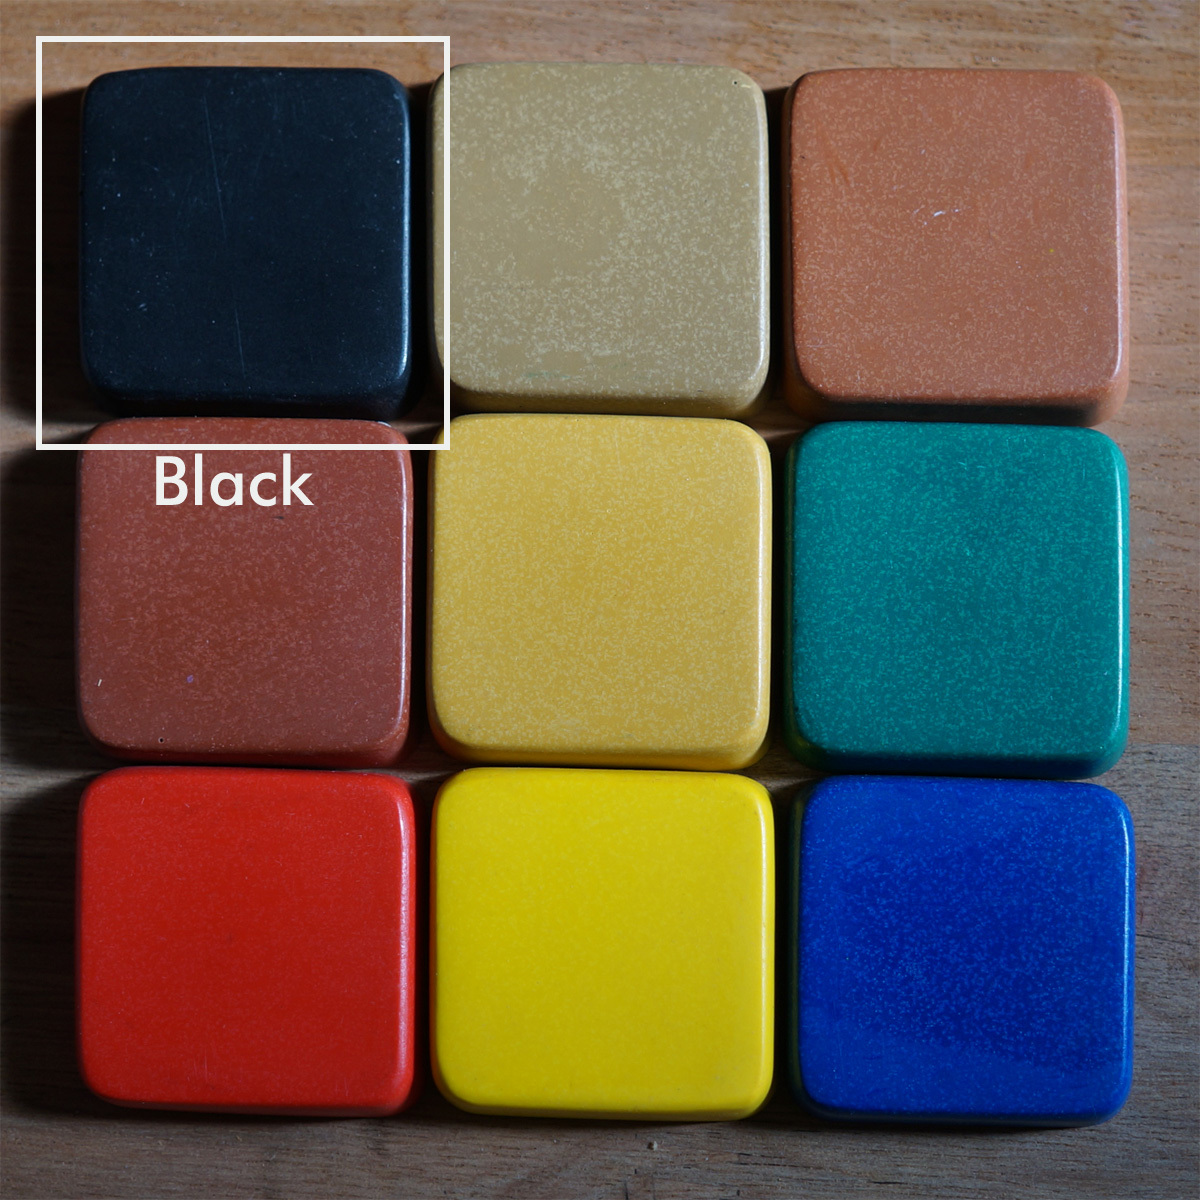 PIGMENT BLACK 300g(着色剤:黒 300g) - 画像2